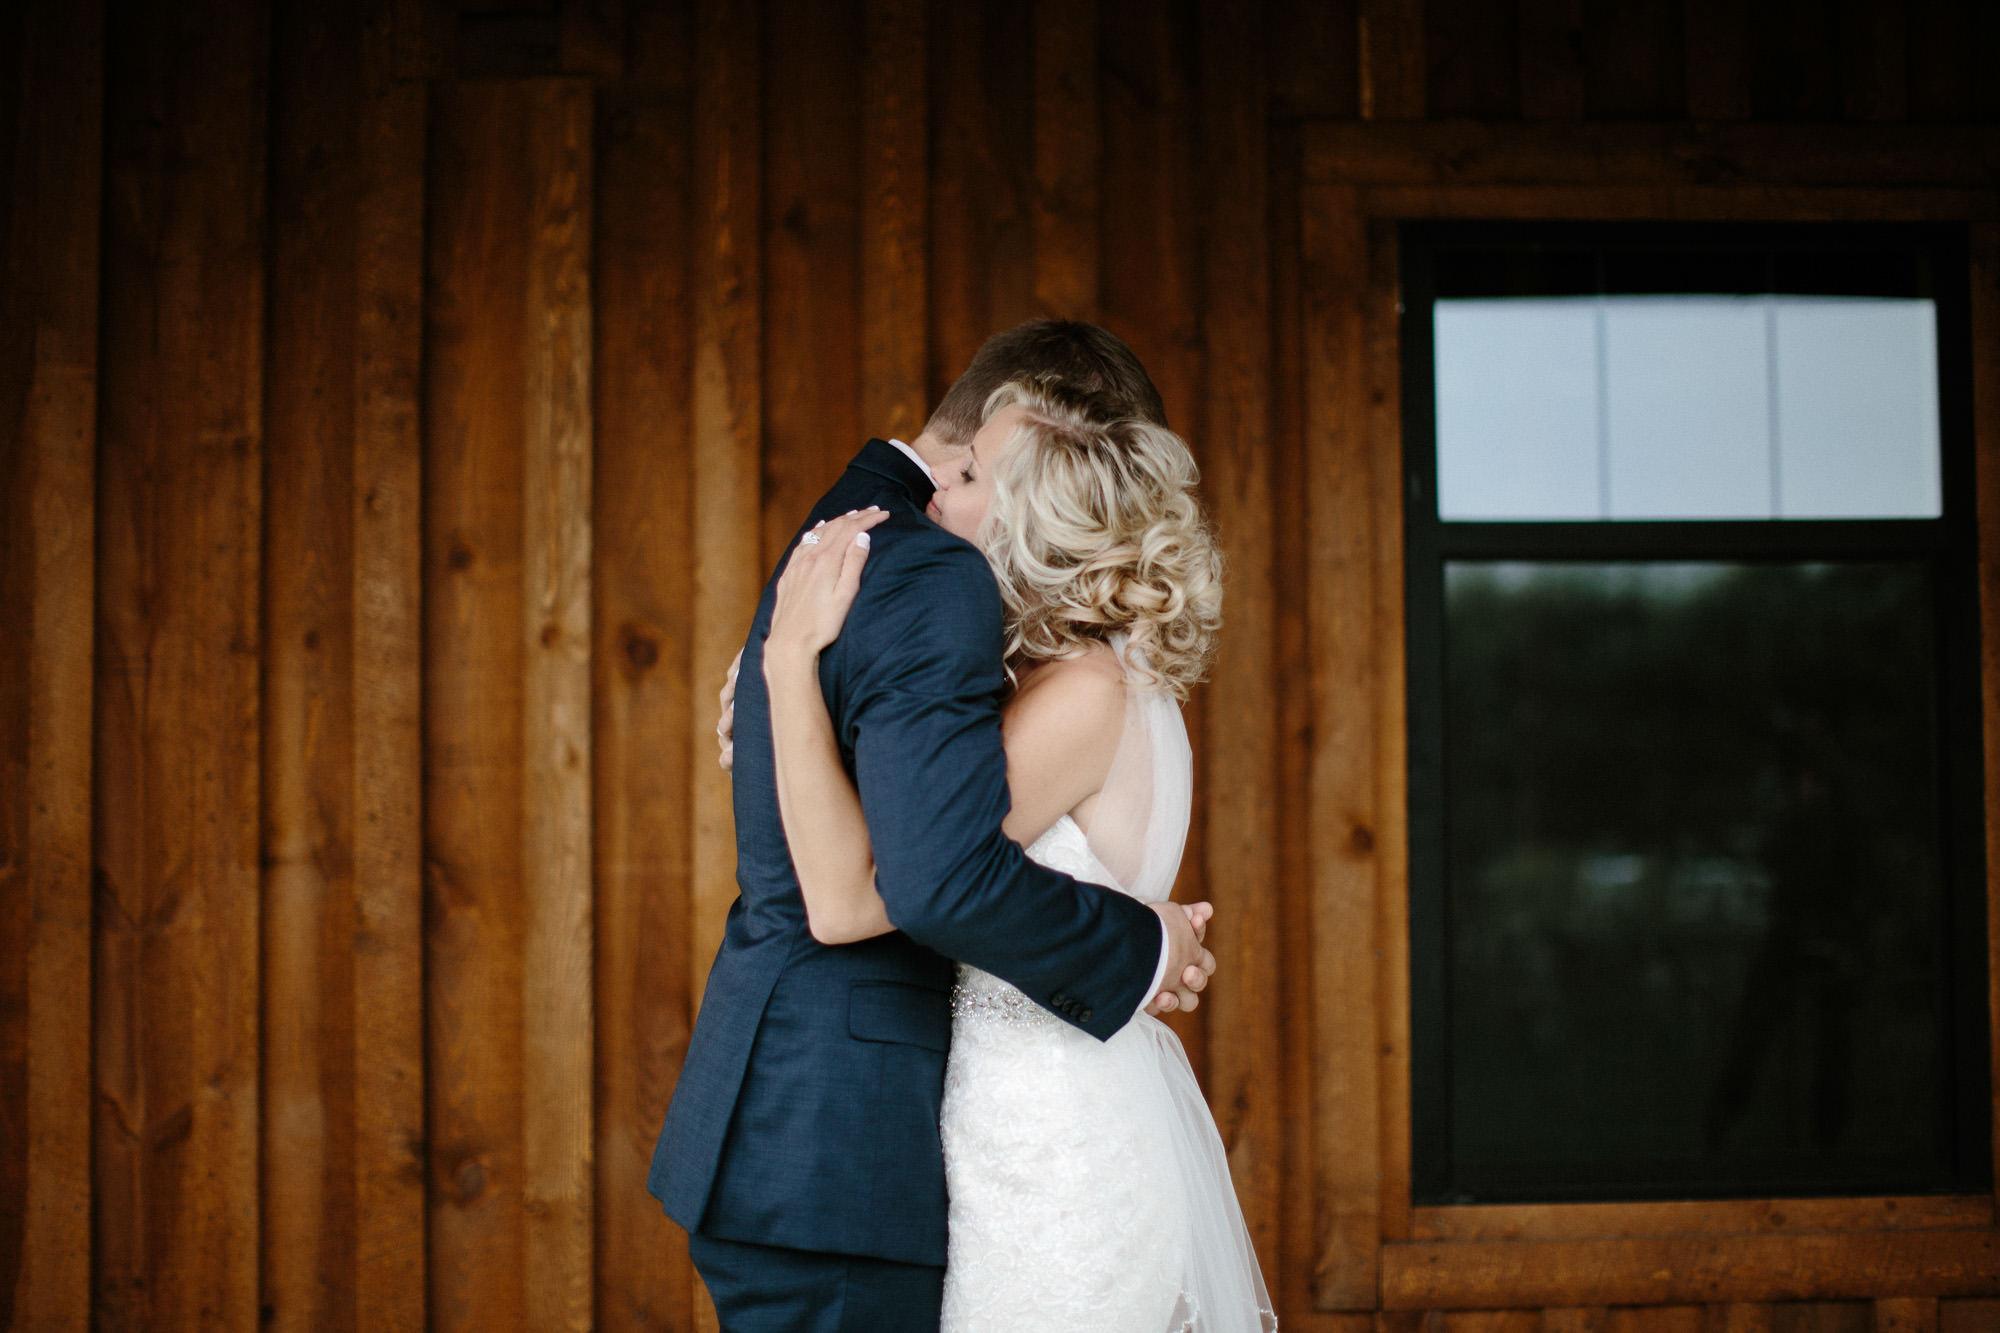 meadow-barn-wedding-sioux-falls-south-dakota-romantic-adventerous-michael-liedtke-photography024.jpg